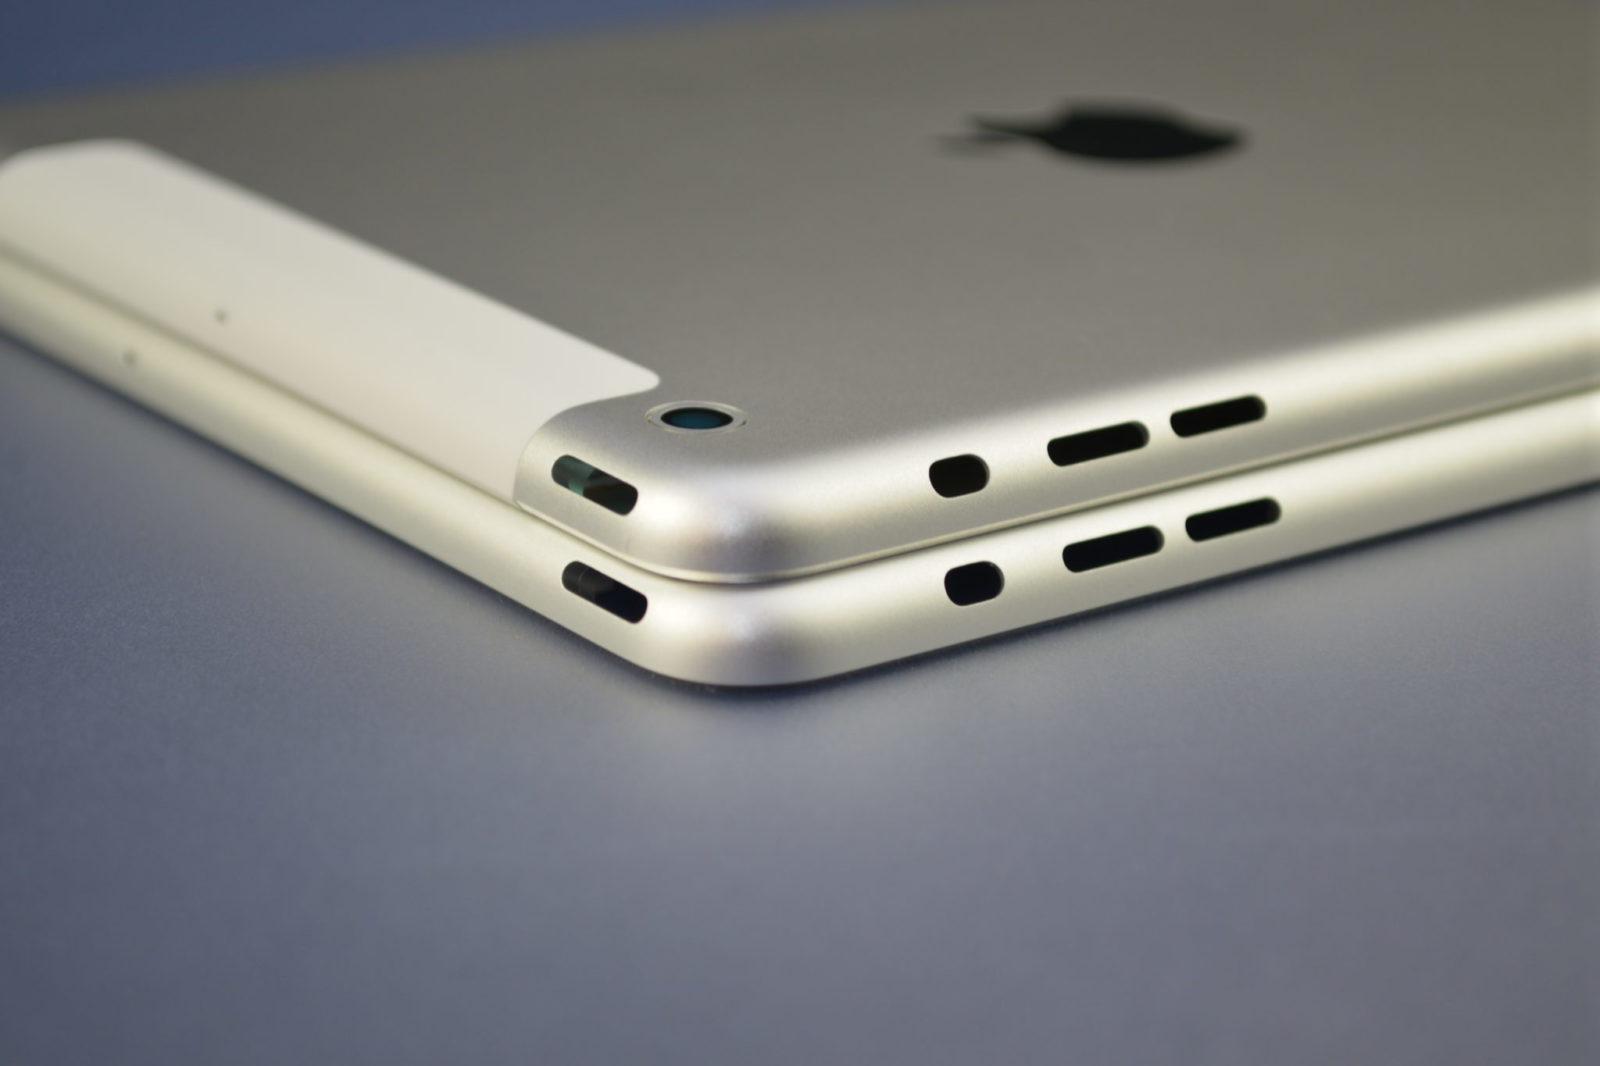 ipad-5-vs-new-ipad-mini